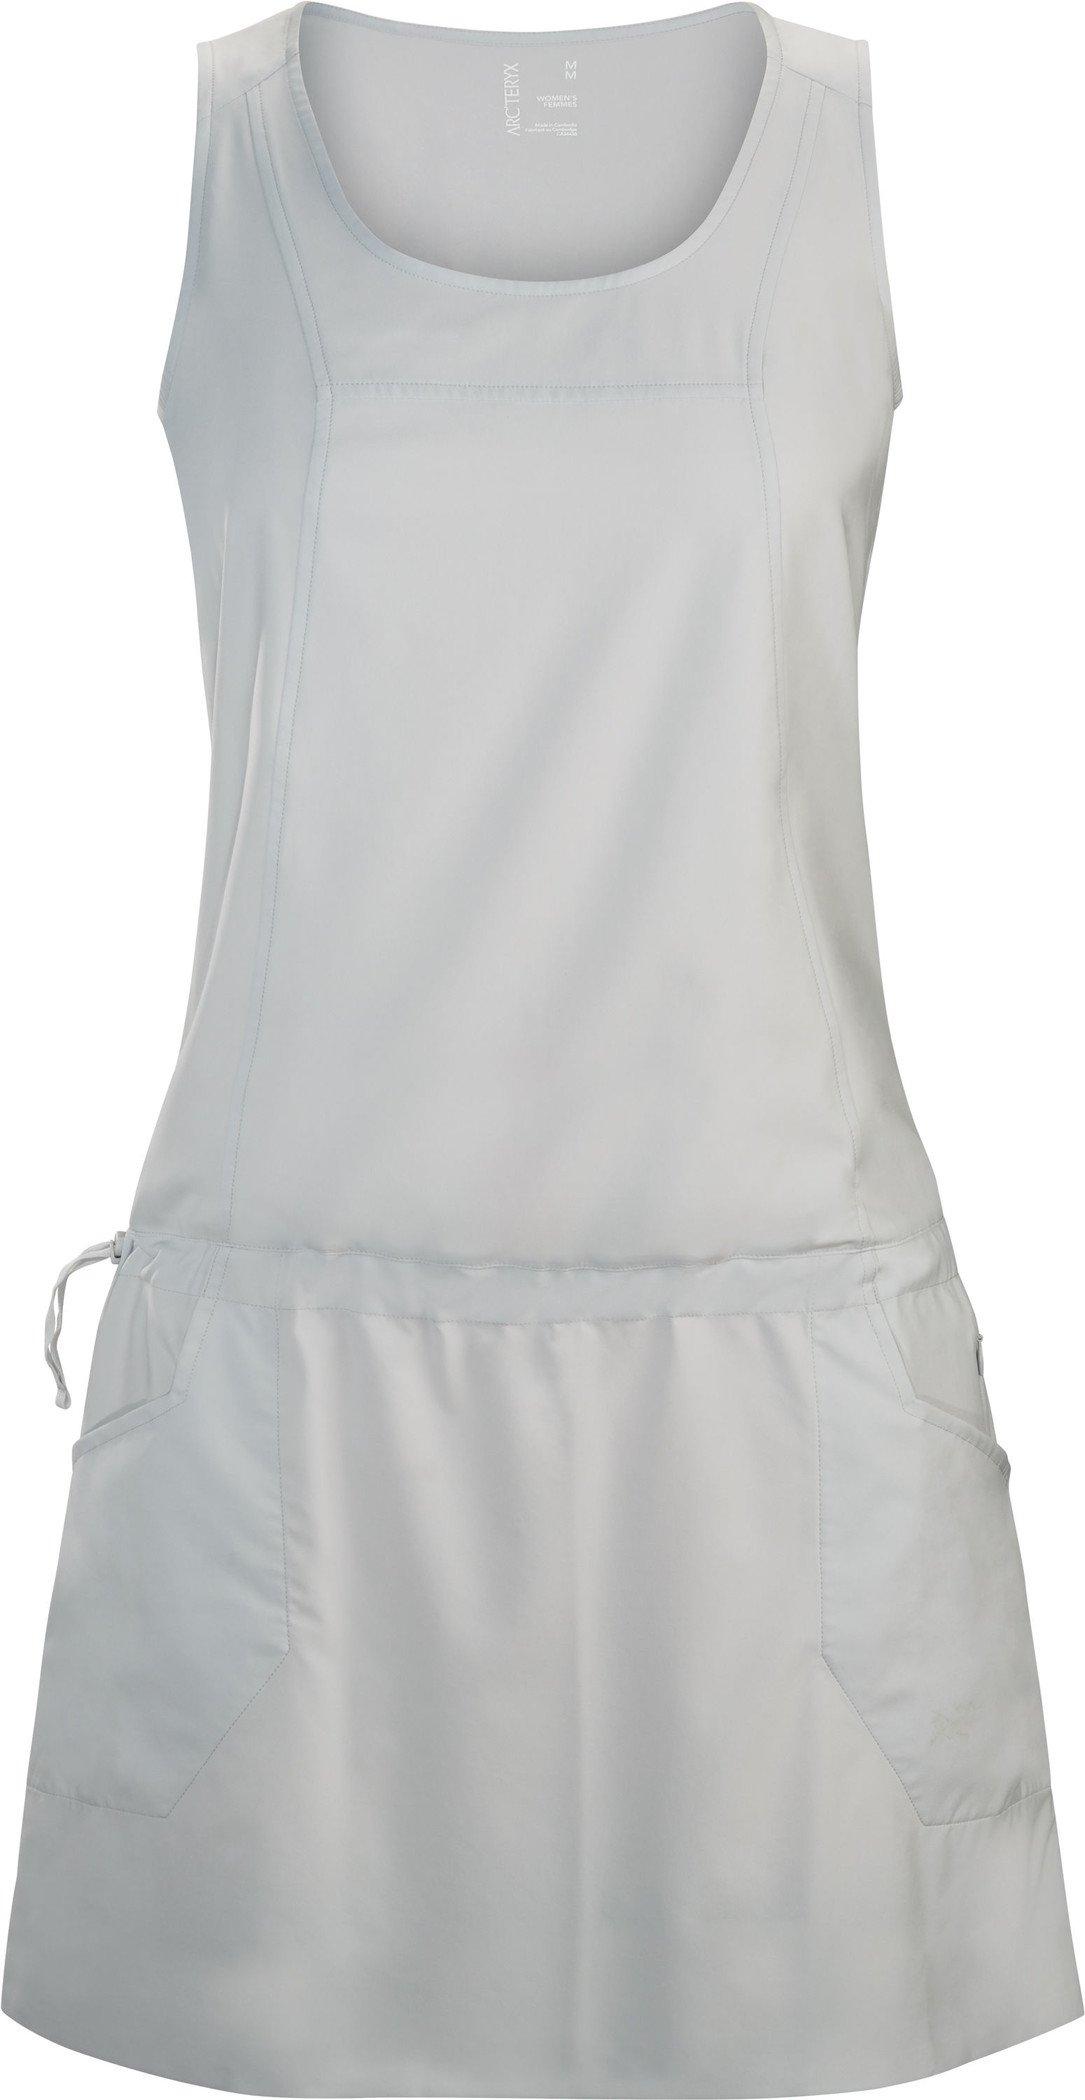 ARC'TERYX Contenta Dress Women's (Athena Grey, Medium)